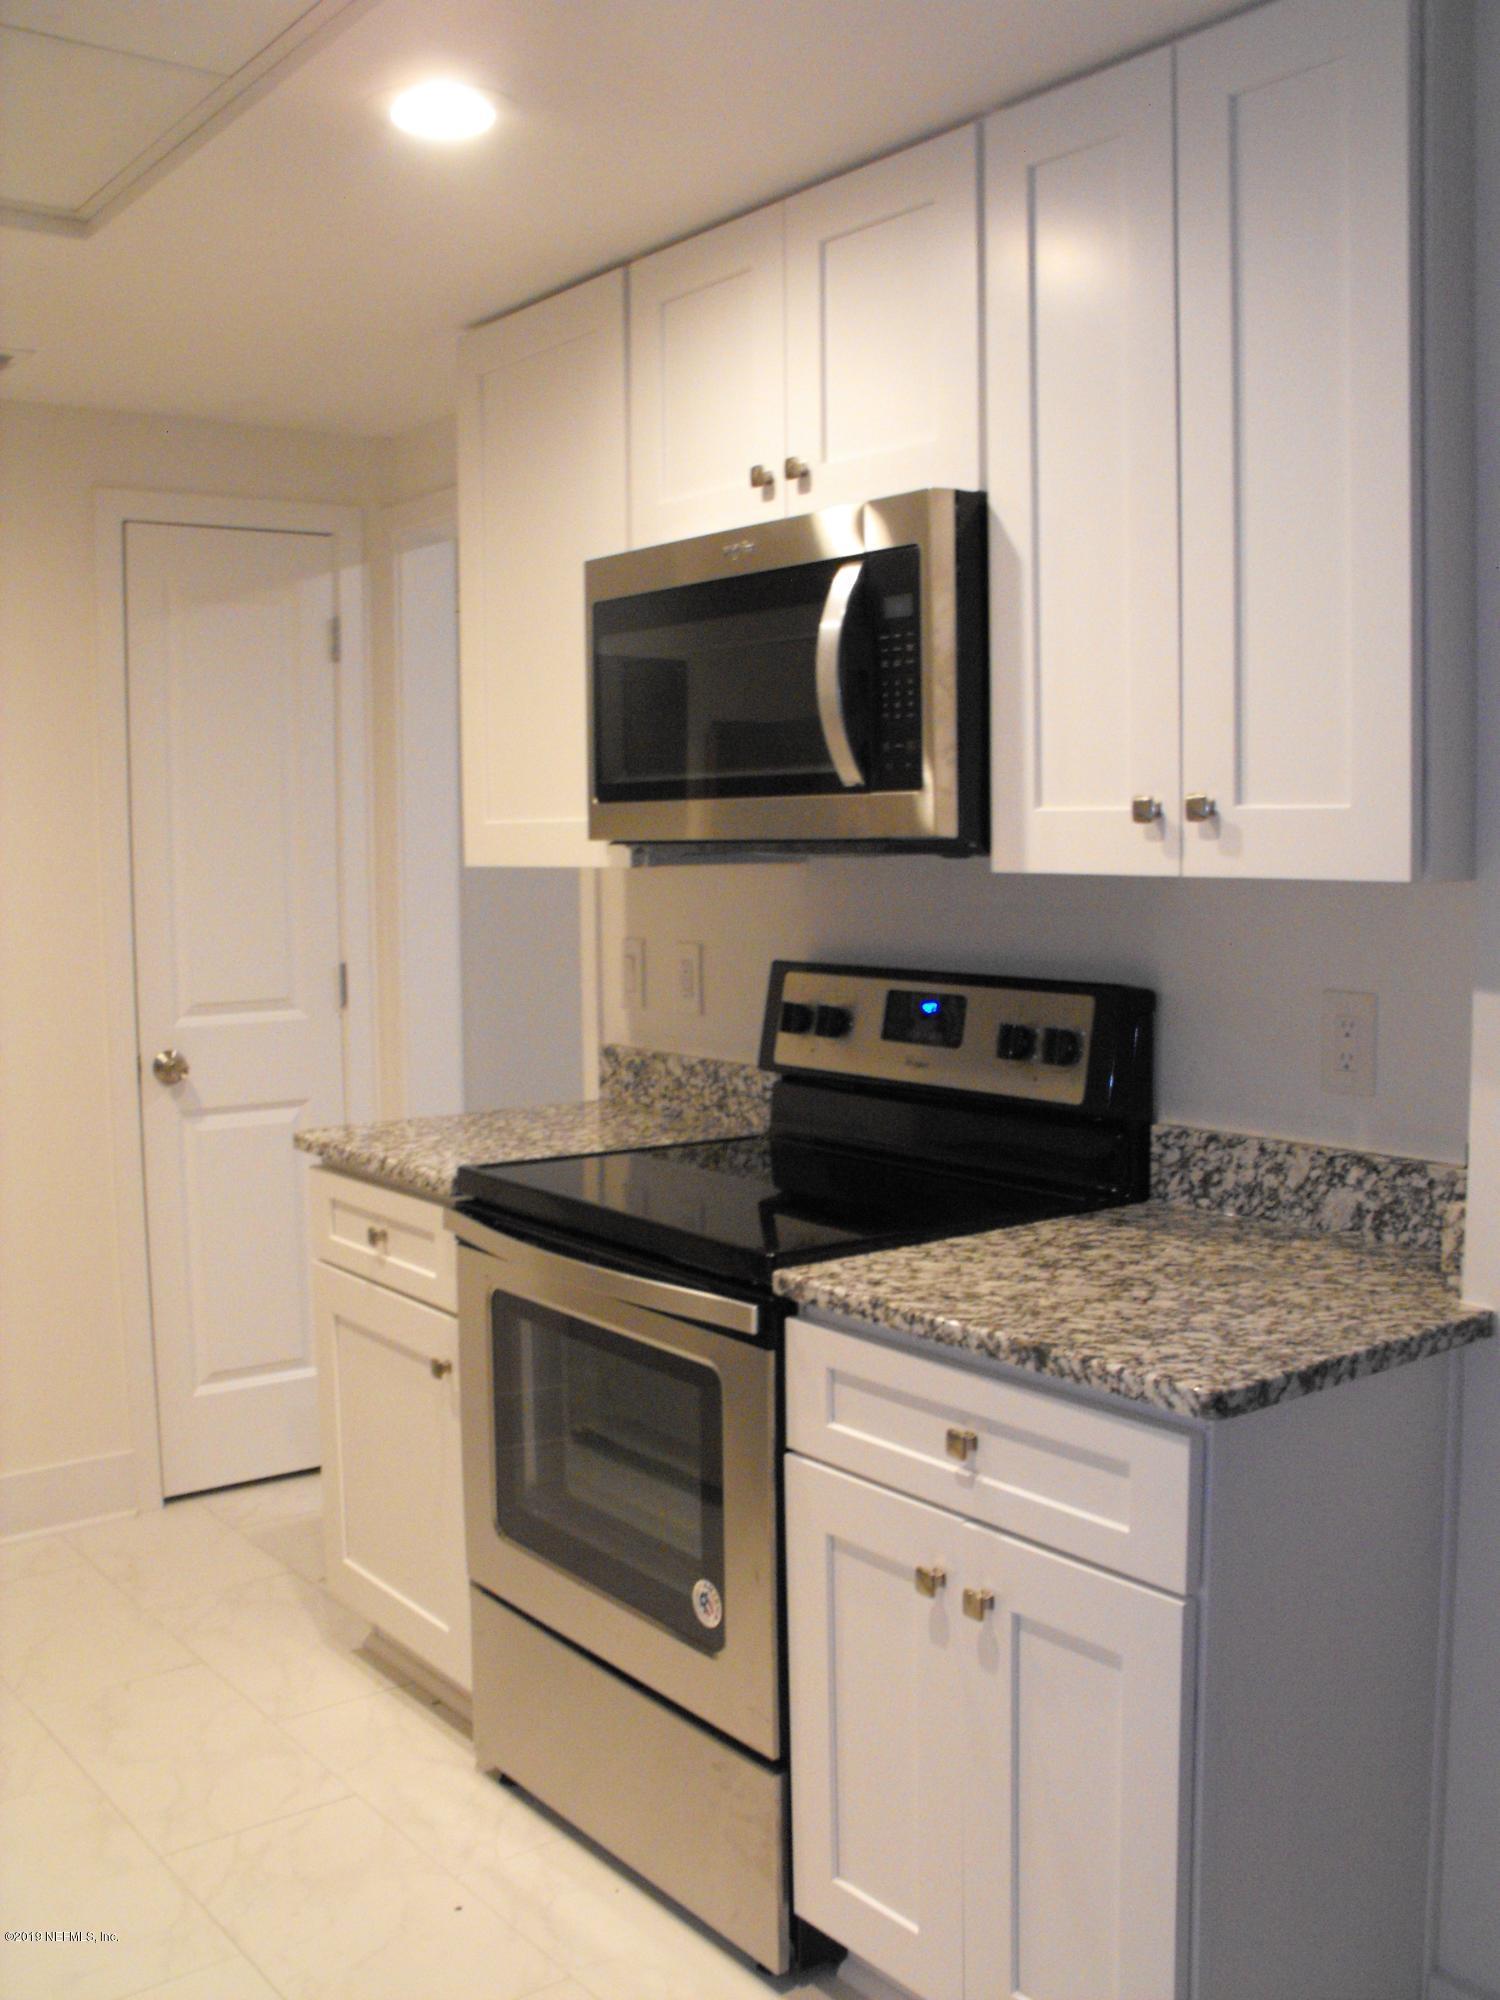 1560 LANCASTER, JACKSONVILLE, FLORIDA 32204, 2 Bedrooms Bedrooms, ,1 BathroomBathrooms,Rental,For sale,LANCASTER,1024729